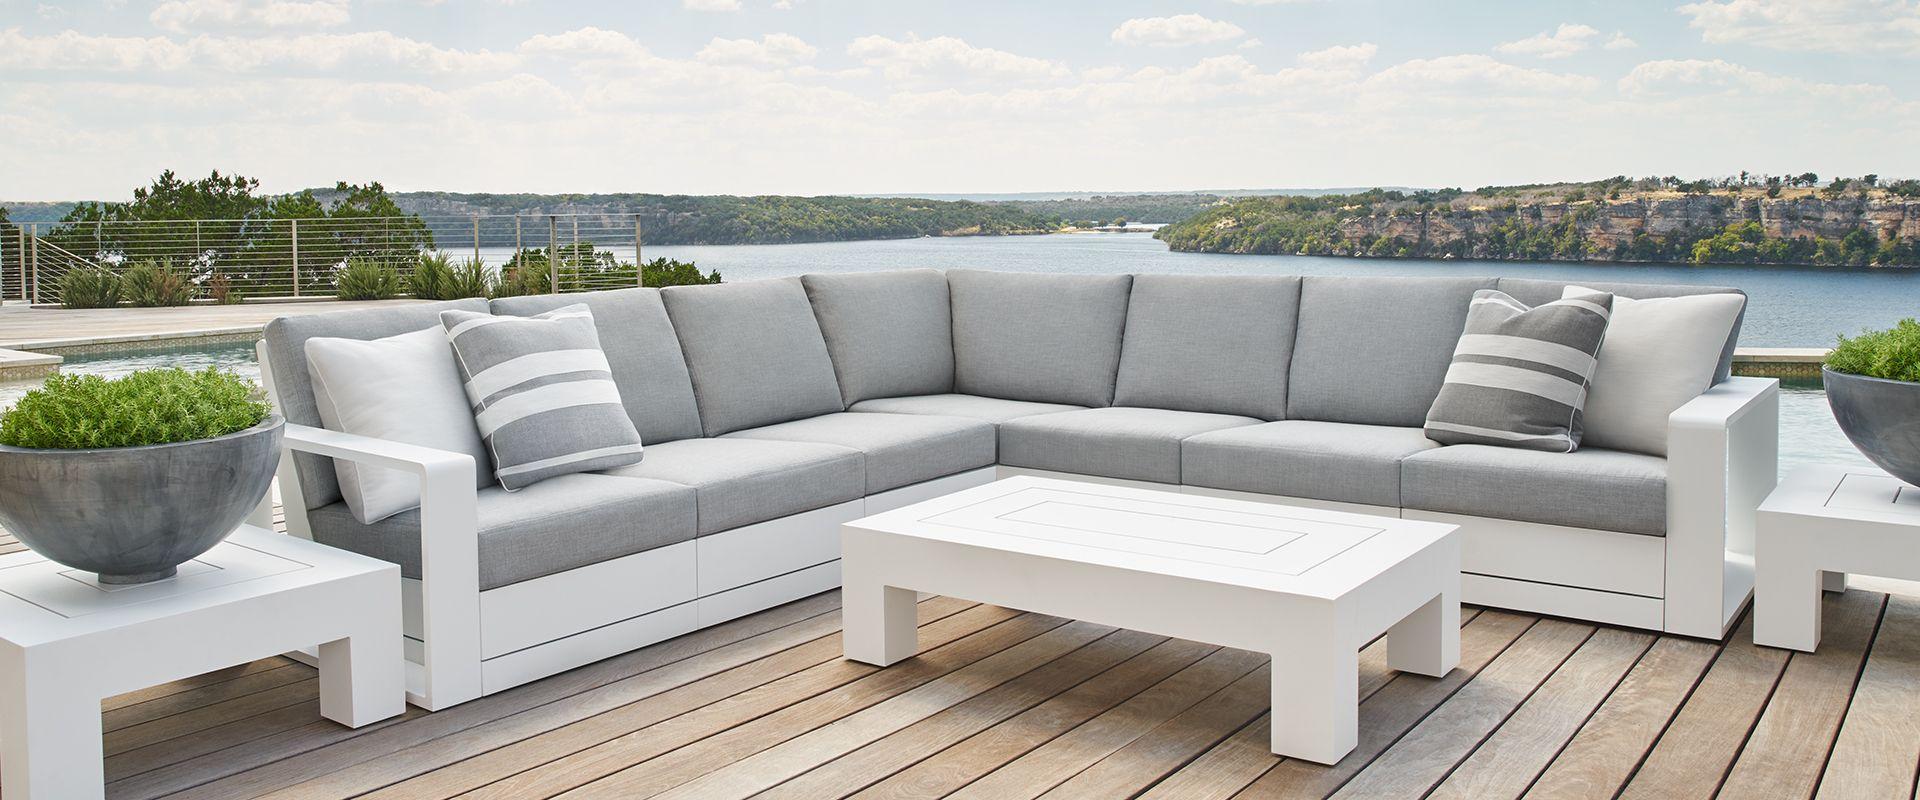 Superior Sutherland Furniture | Luxury Outdoor Furniture And Indoor Accessories